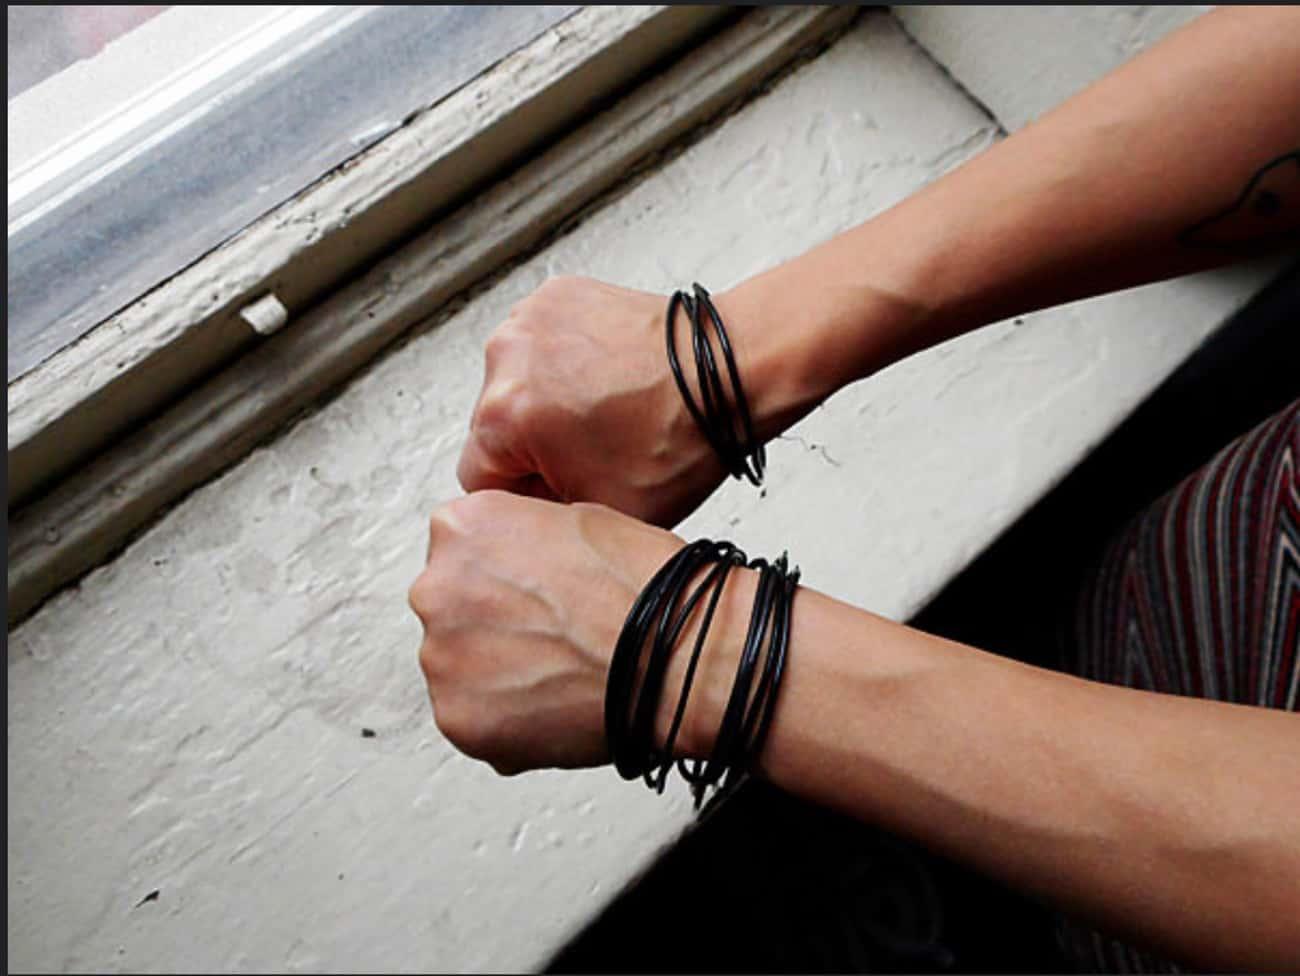 Black Jelly Bracelets Meaning Images